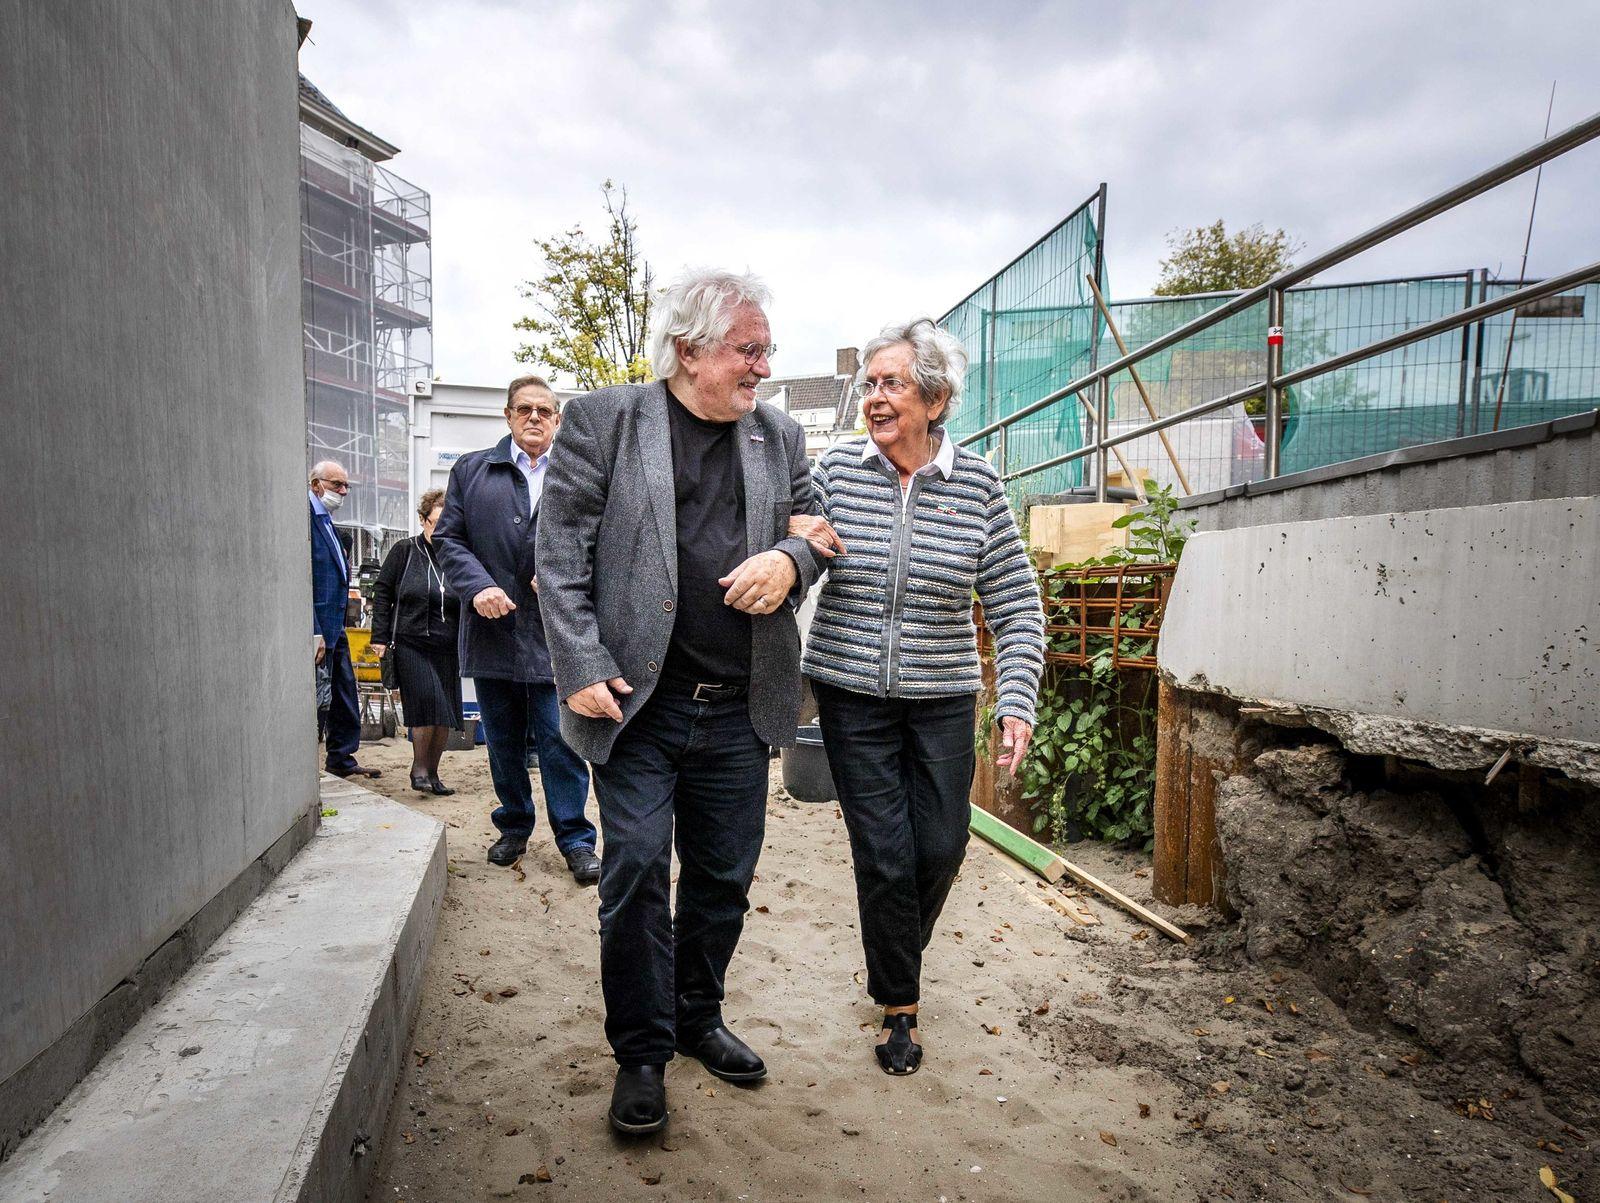 Erster Namensstein für Holocaust-Mahnmal in Amsterdam